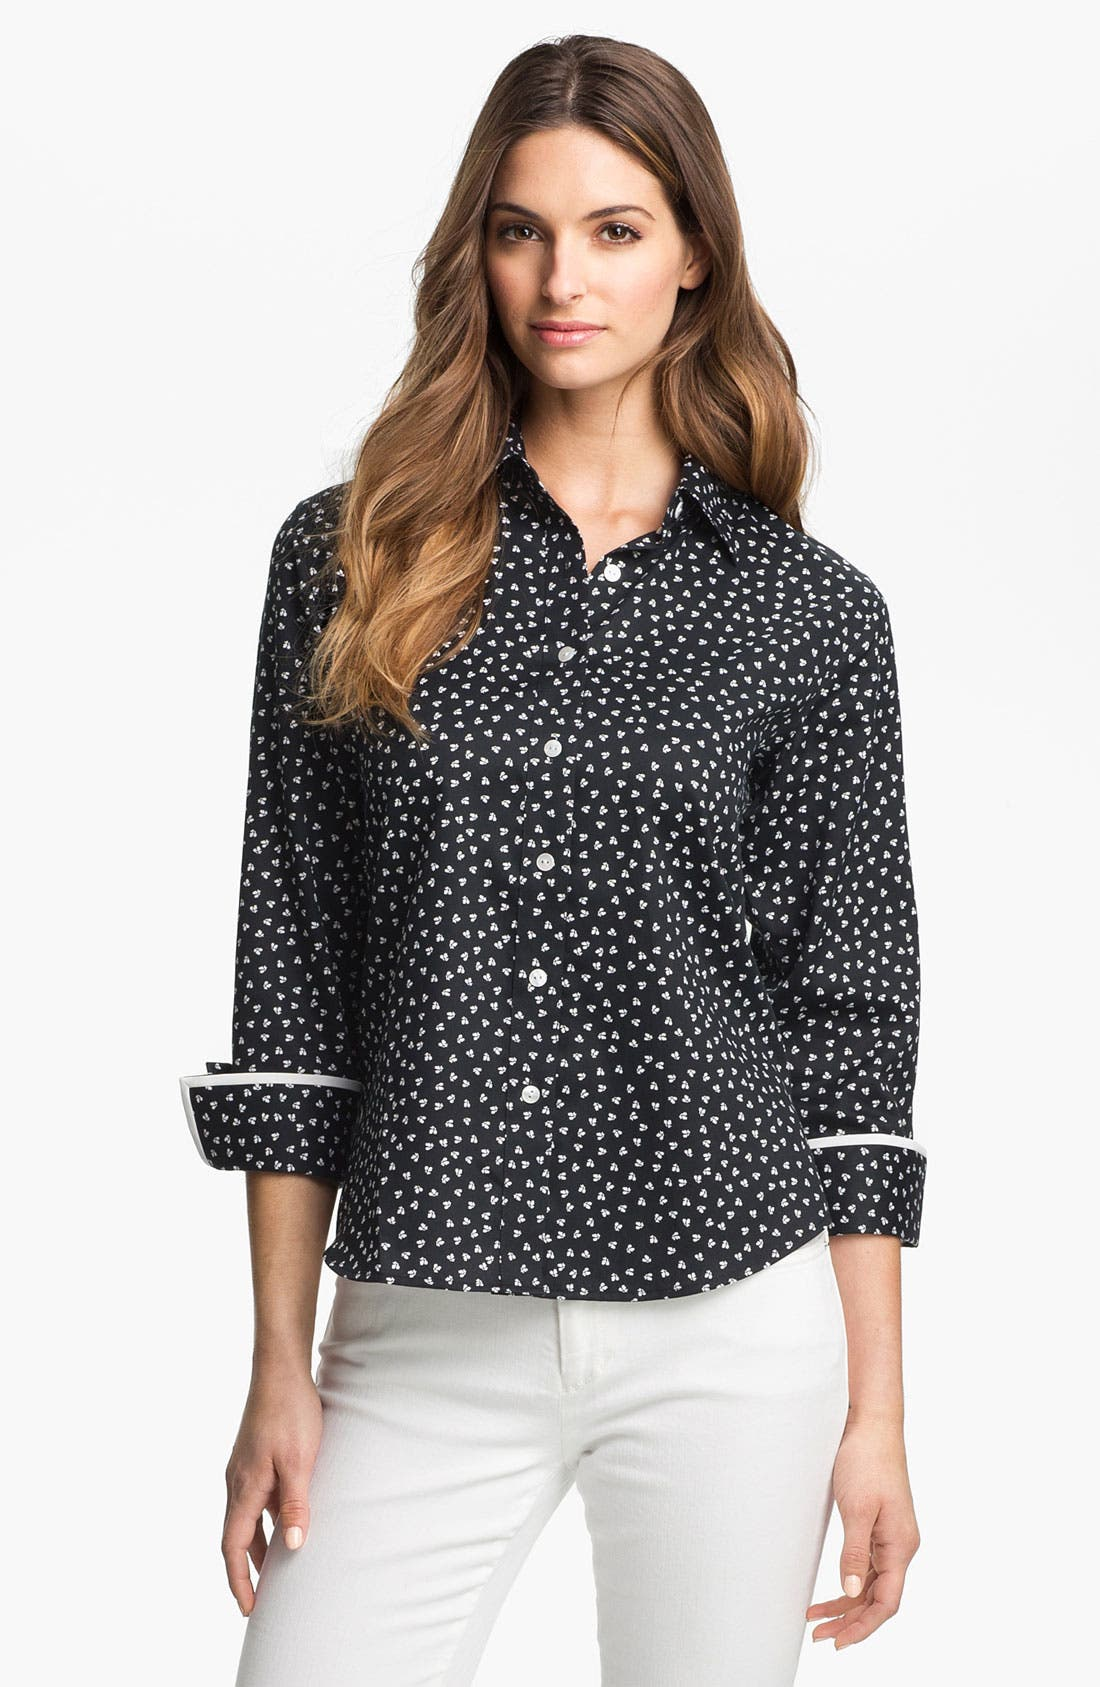 Alternate Image 1 Selected - Foxcroft 'Falling Blossoms' Shirt (Petite)